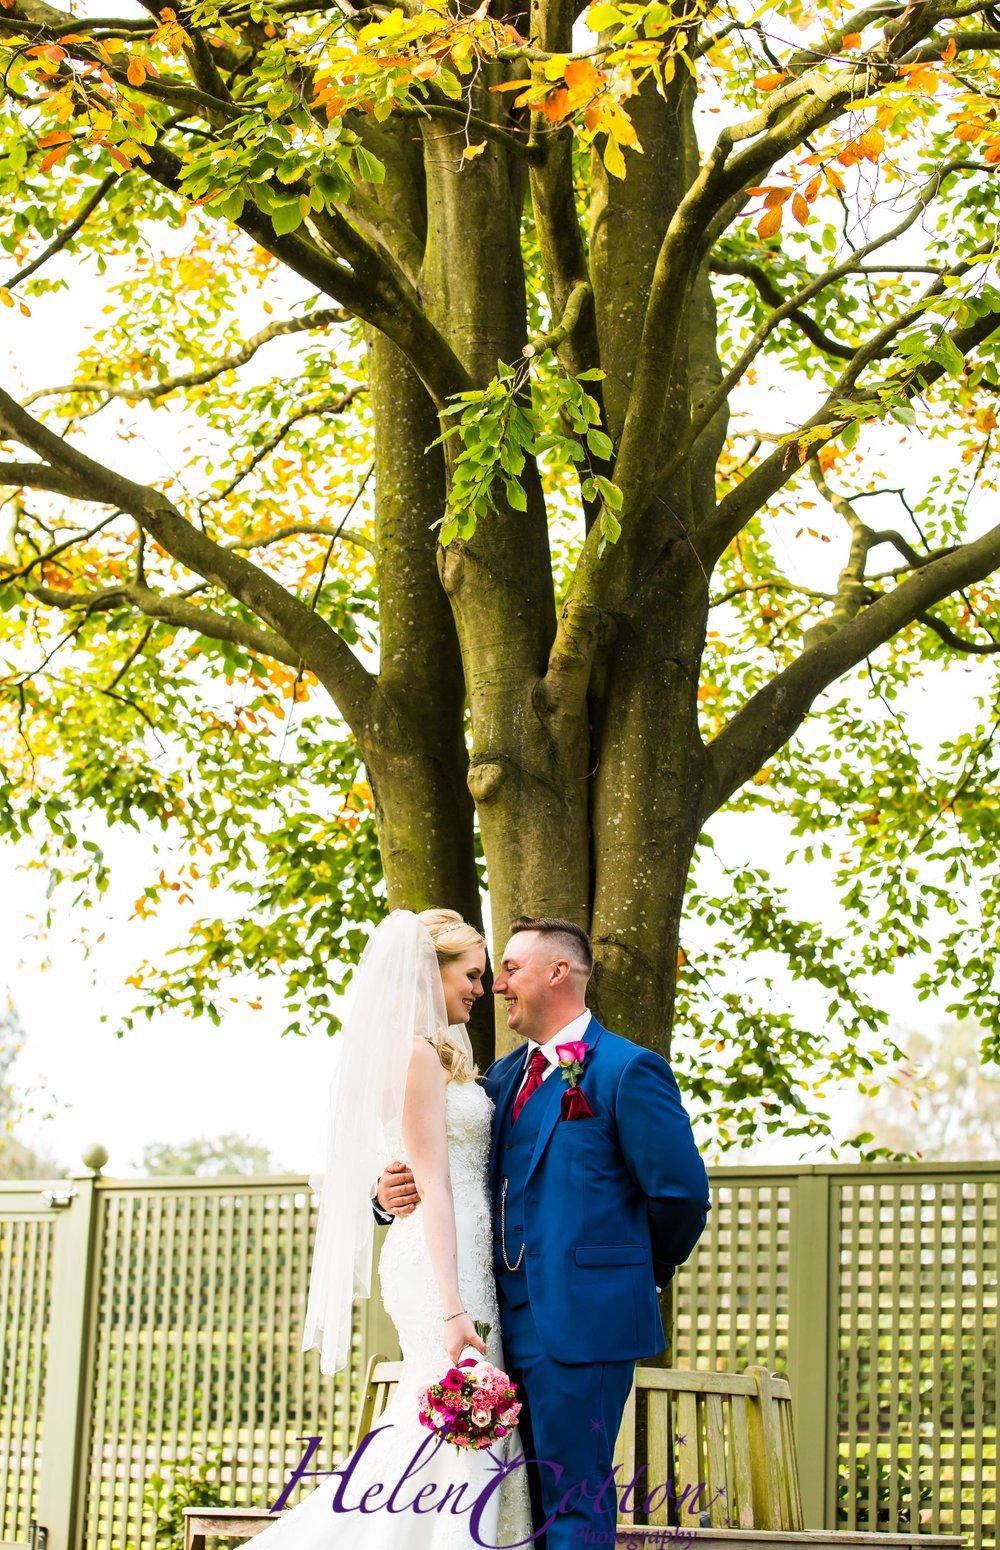 Stacy & Chris_Moddershall Oaks_Helen Cotton Photography©_1.JPG